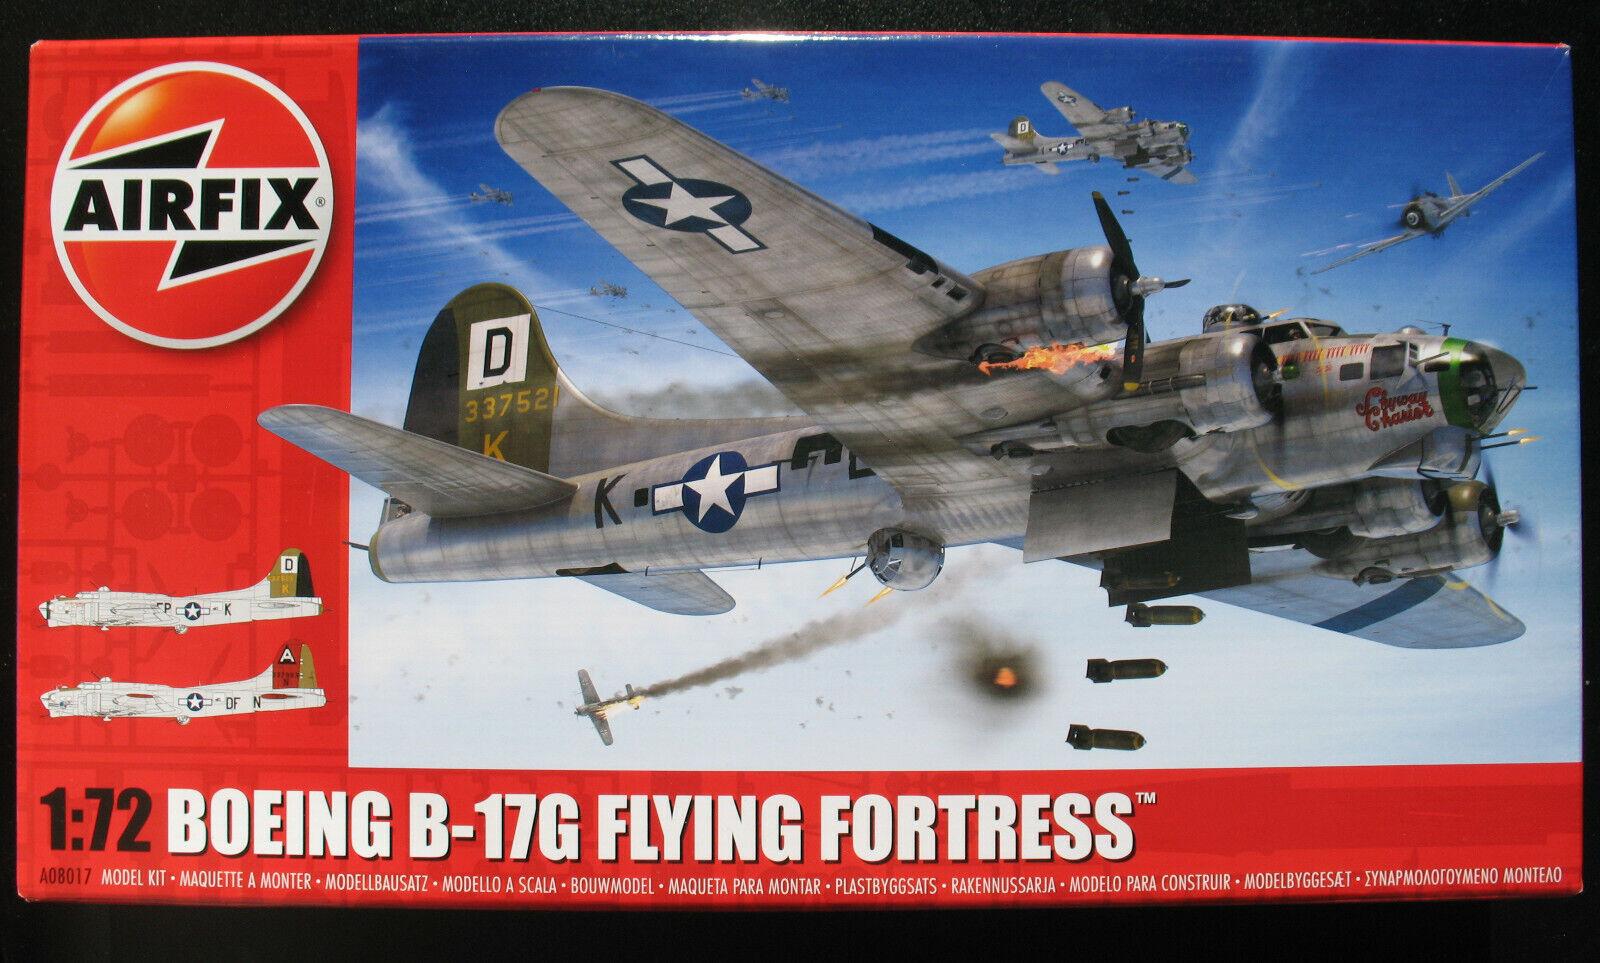 AIRFIX A08017 - BOEING B-17-G B-17-G B-17-G Flying Fortress - 1 72 -Flugzeug Modellbausatz Kit  | Üppiges Design  b294a4